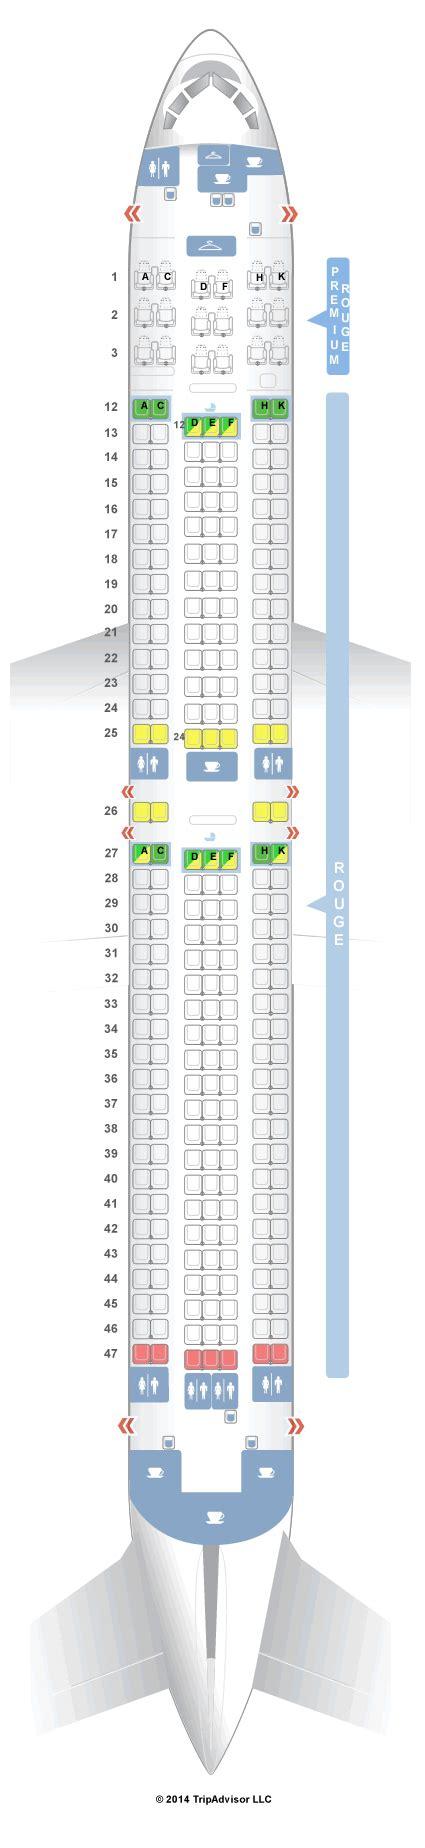 767 300 seating air canada air canada 763 seat map related keywords air canada 763